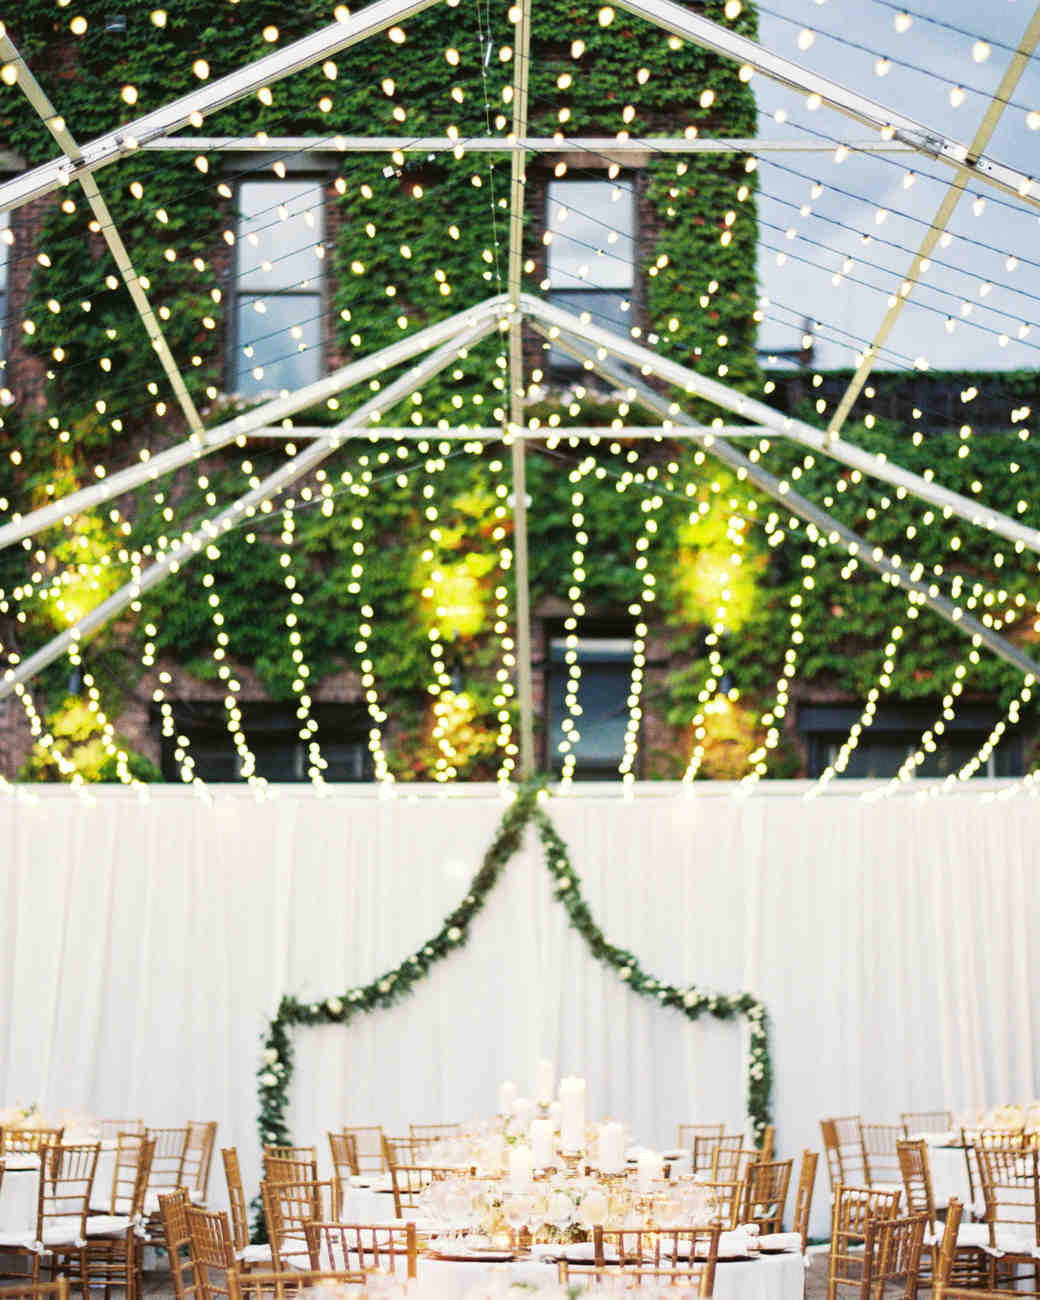 jess-levin-wedding-venue-tips-4-0316.jpg